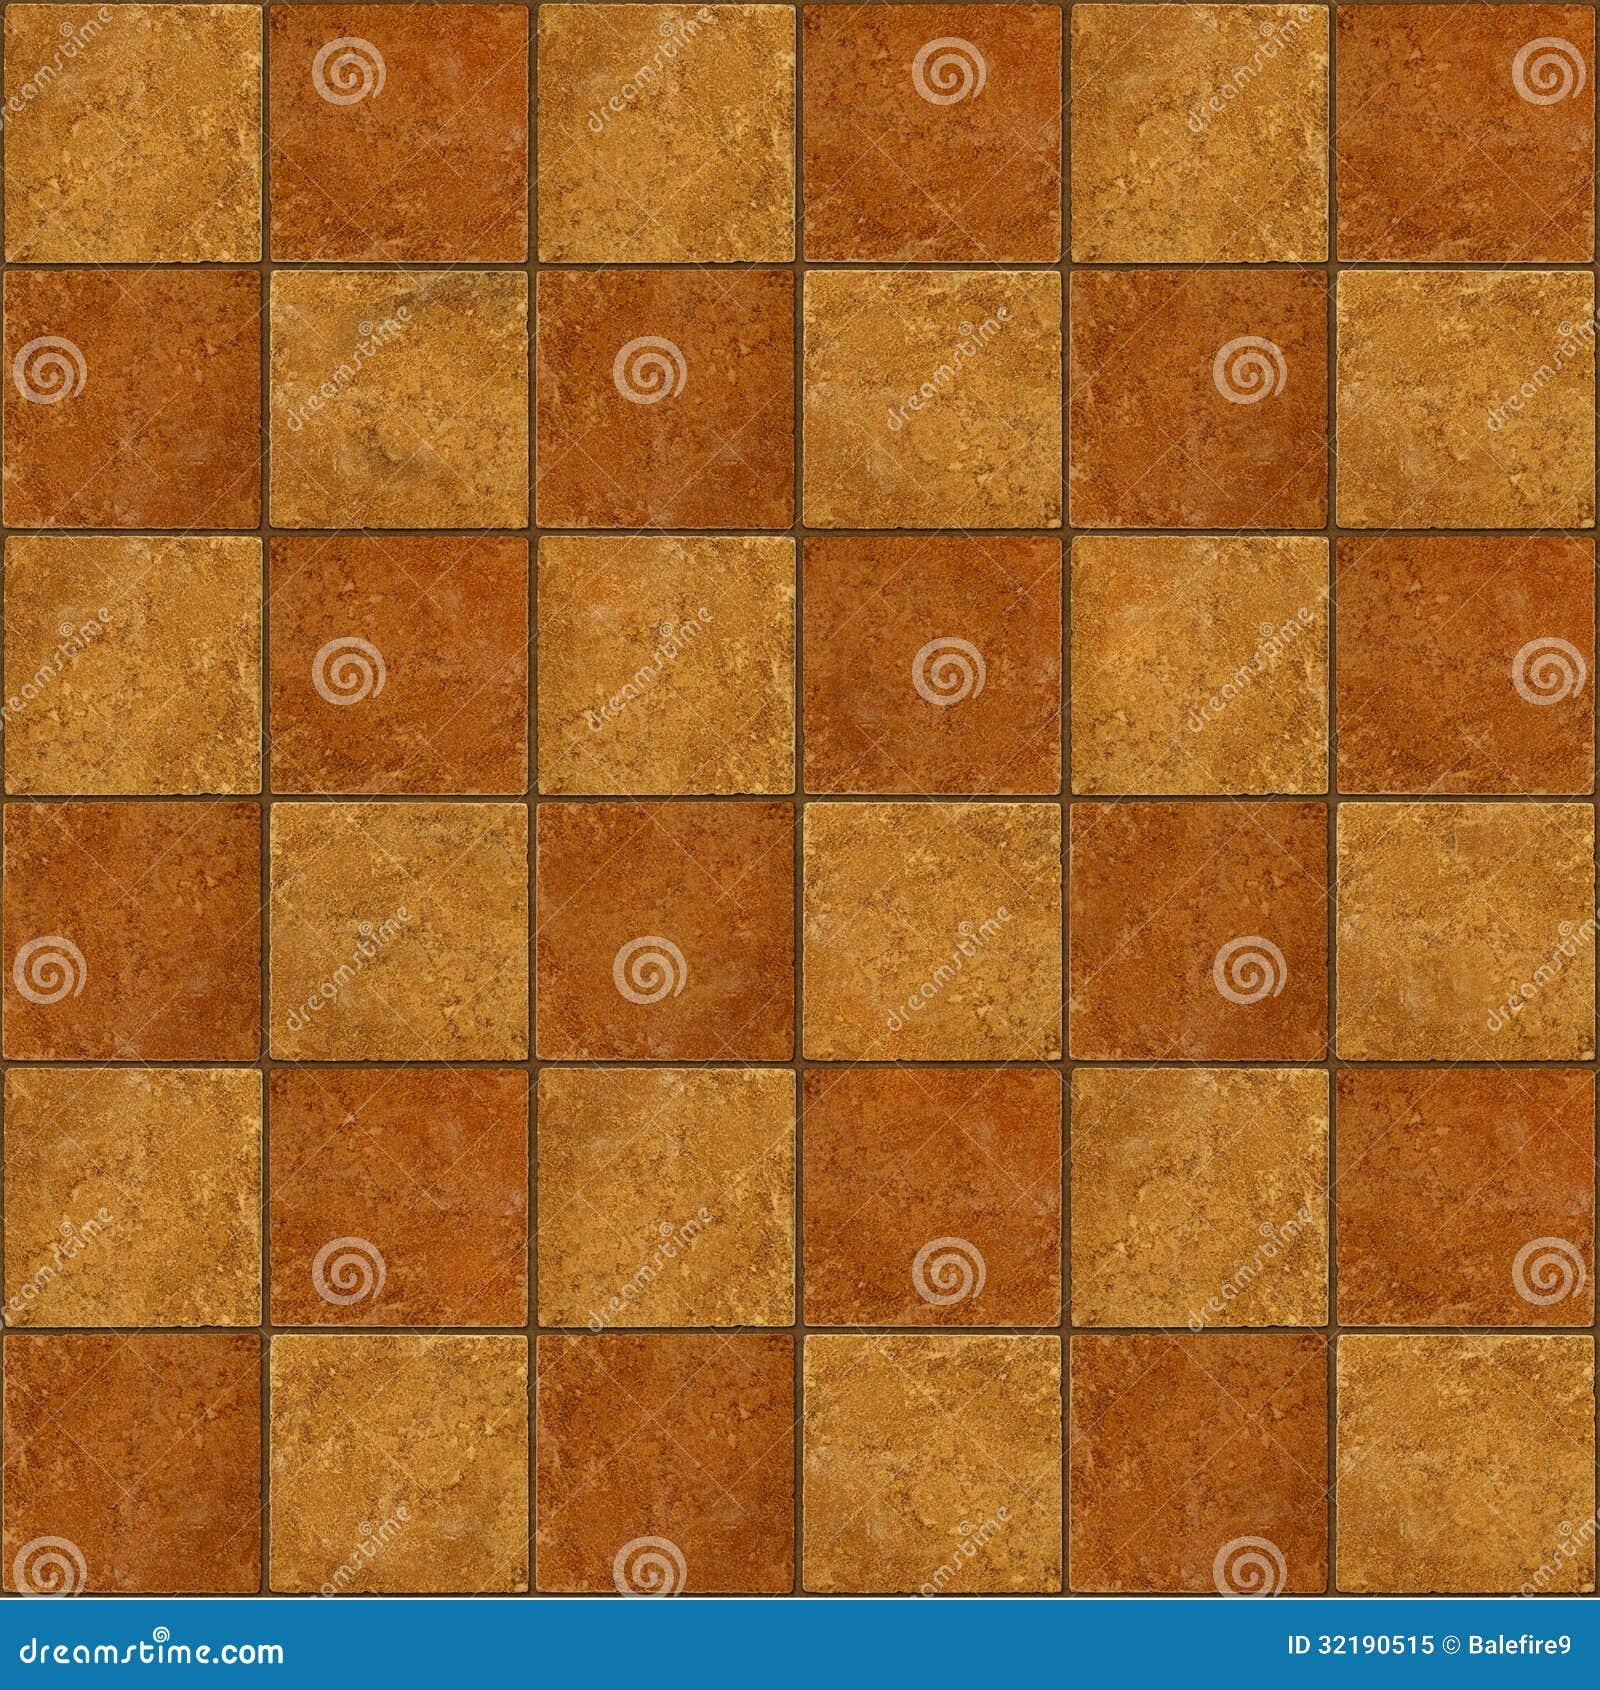 Checkerboard Ceramic Brown Stone Tiles Seamlessly Tileabl